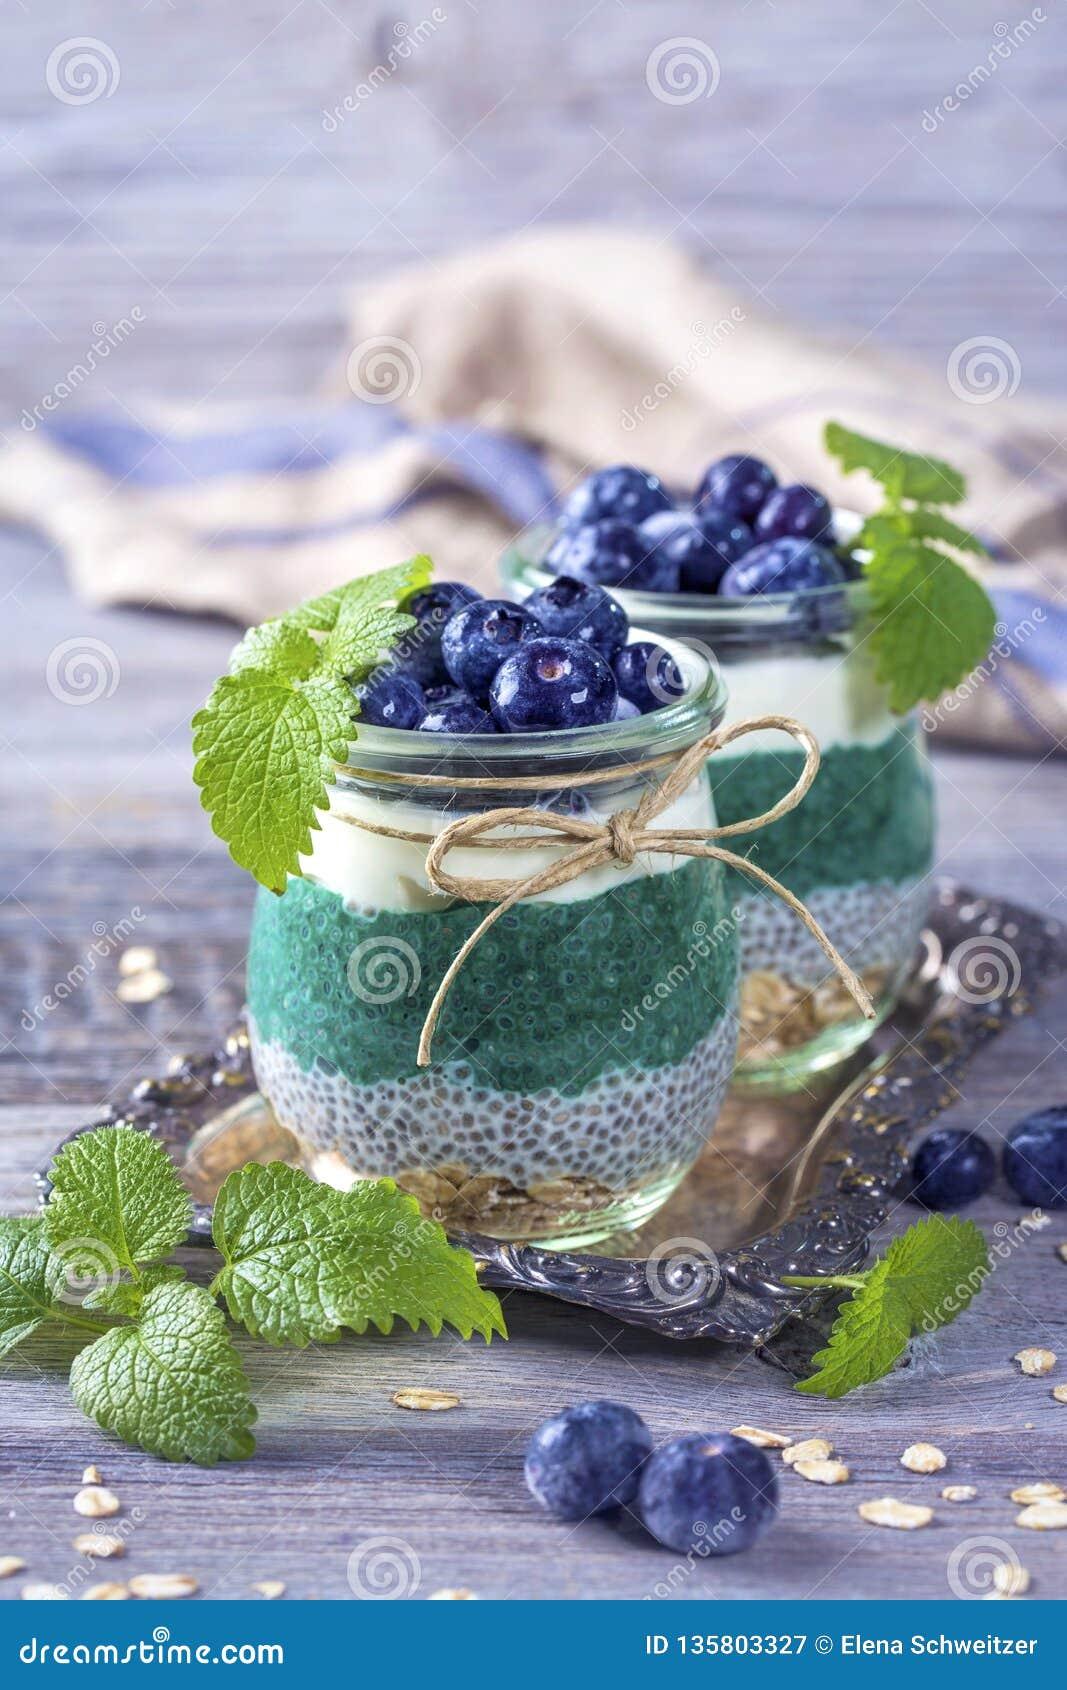 Chia seeds with spirulina pudding